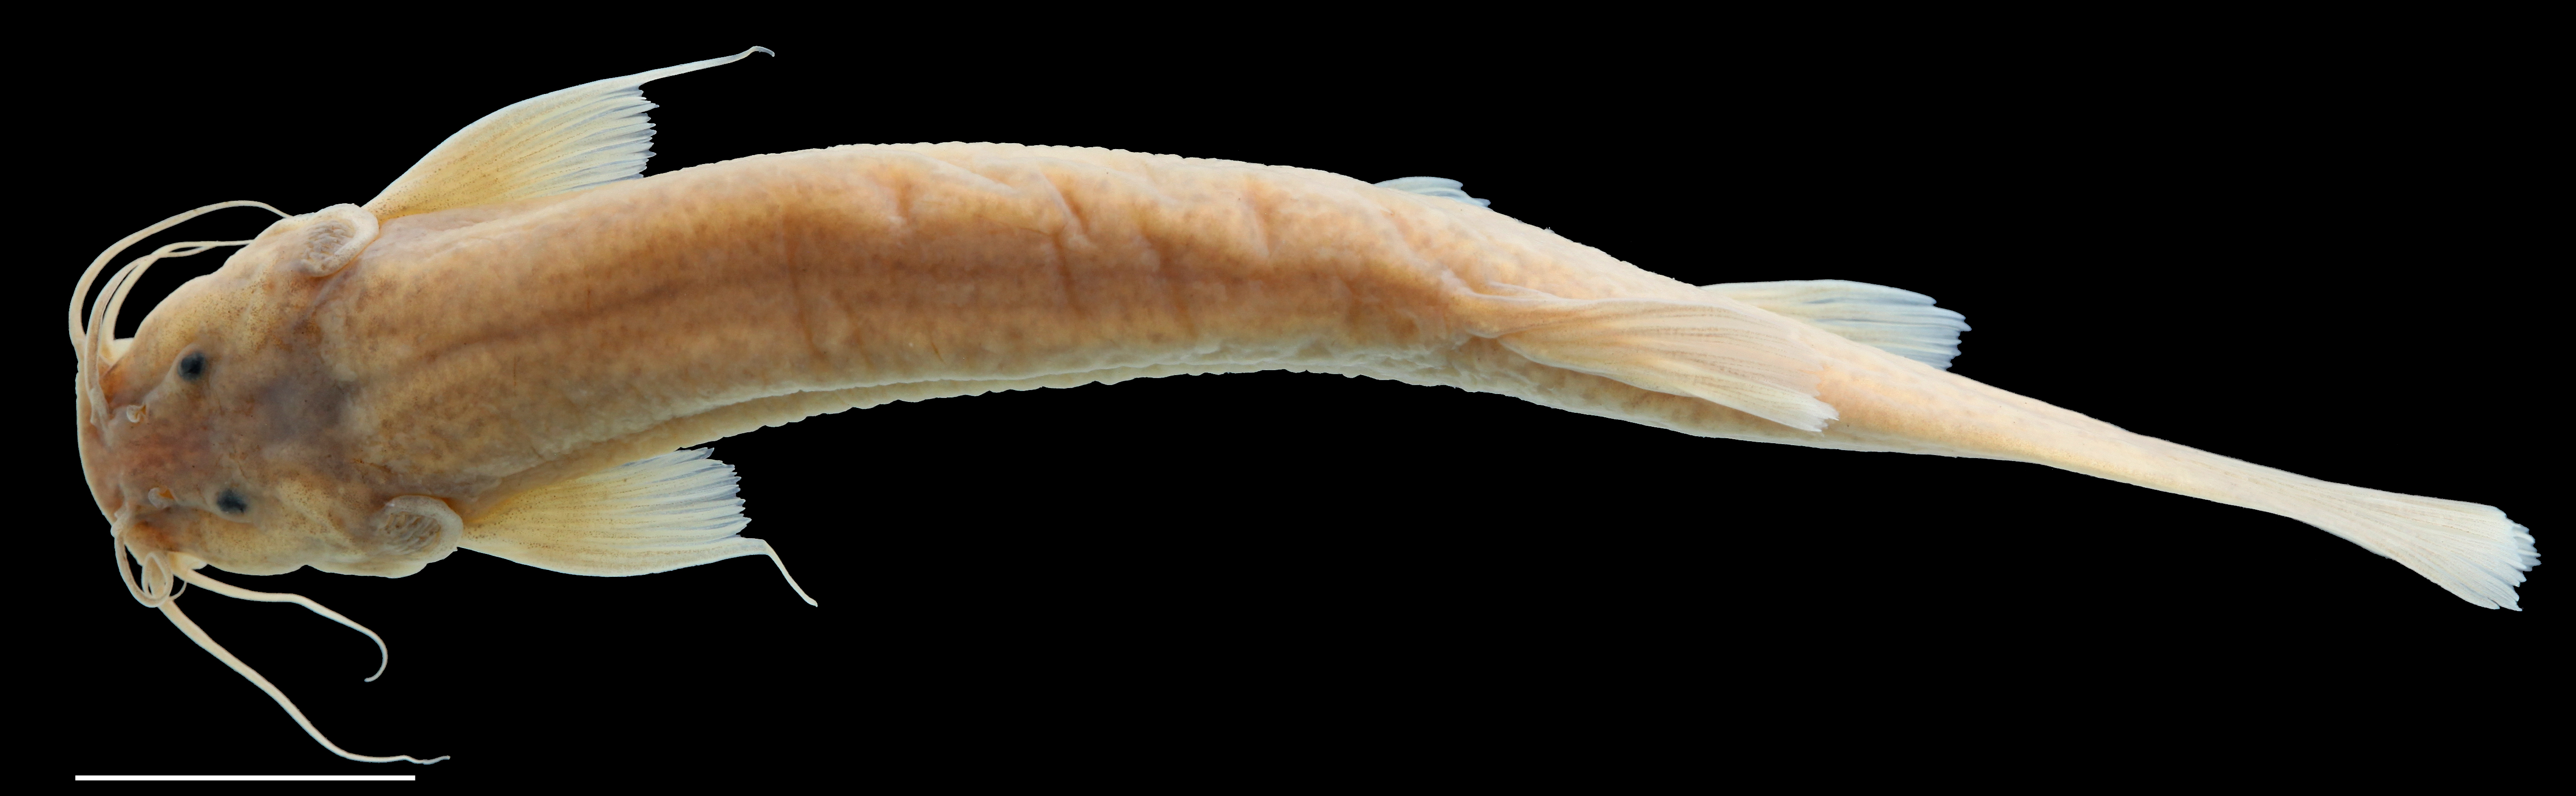 Paratípo de <em>Trichomycterus tetuanensis</em>, IAvH-P-12753_Dorsal, 67.6 mm SL (scale bar = 1 cm). Photograph by C. DoNascimiento.